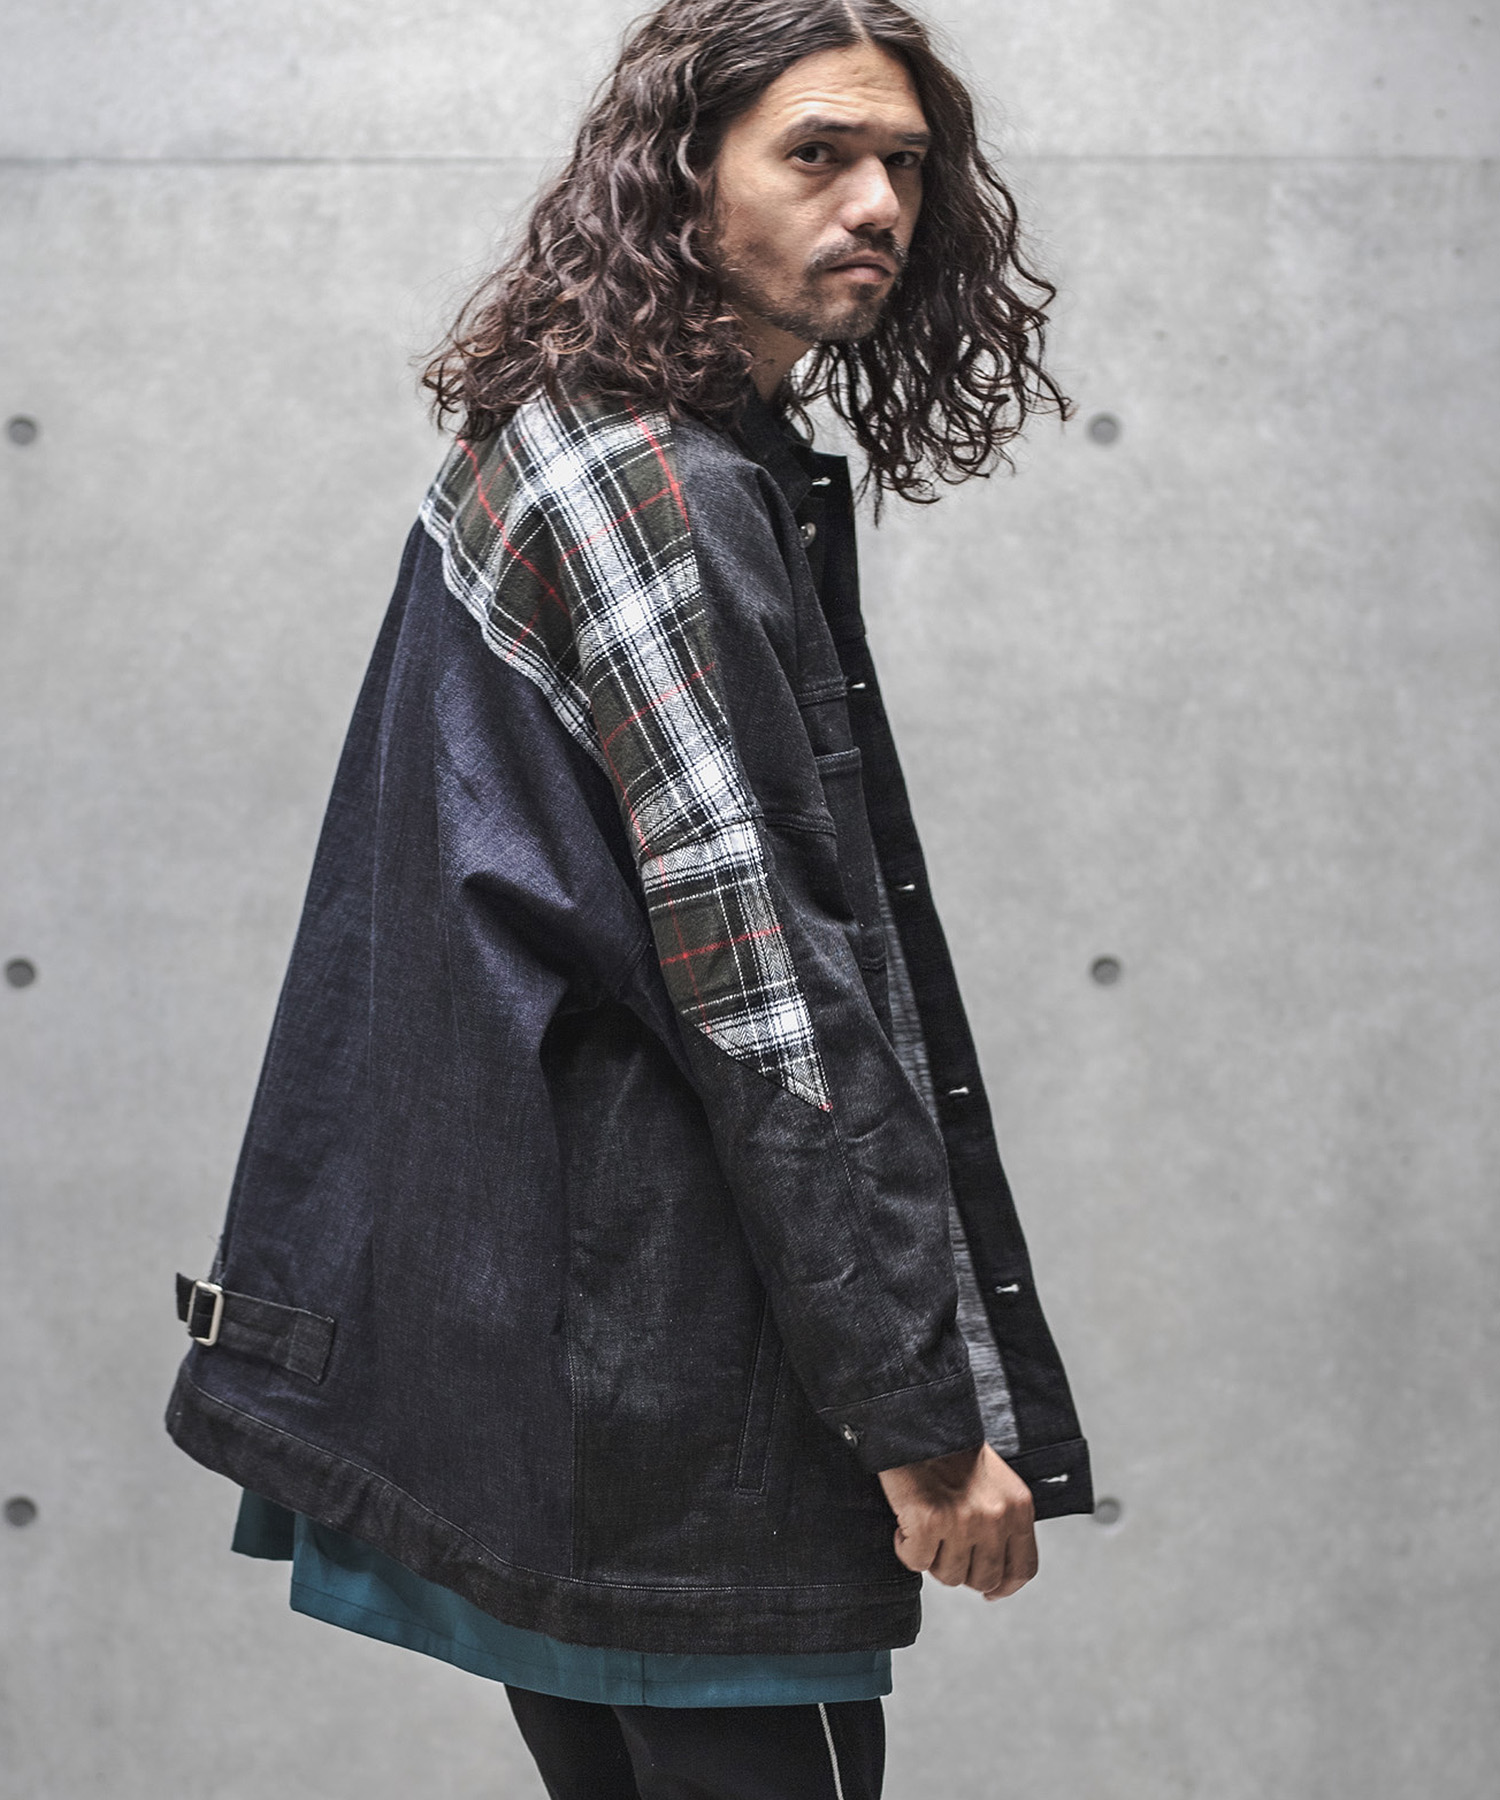 【GLIMCLAP(グリムクラップ)】【予約販売10月上旬~中旬入荷】Warm material denim & Plaid switching Jacket ジャケット(42gla-ca)